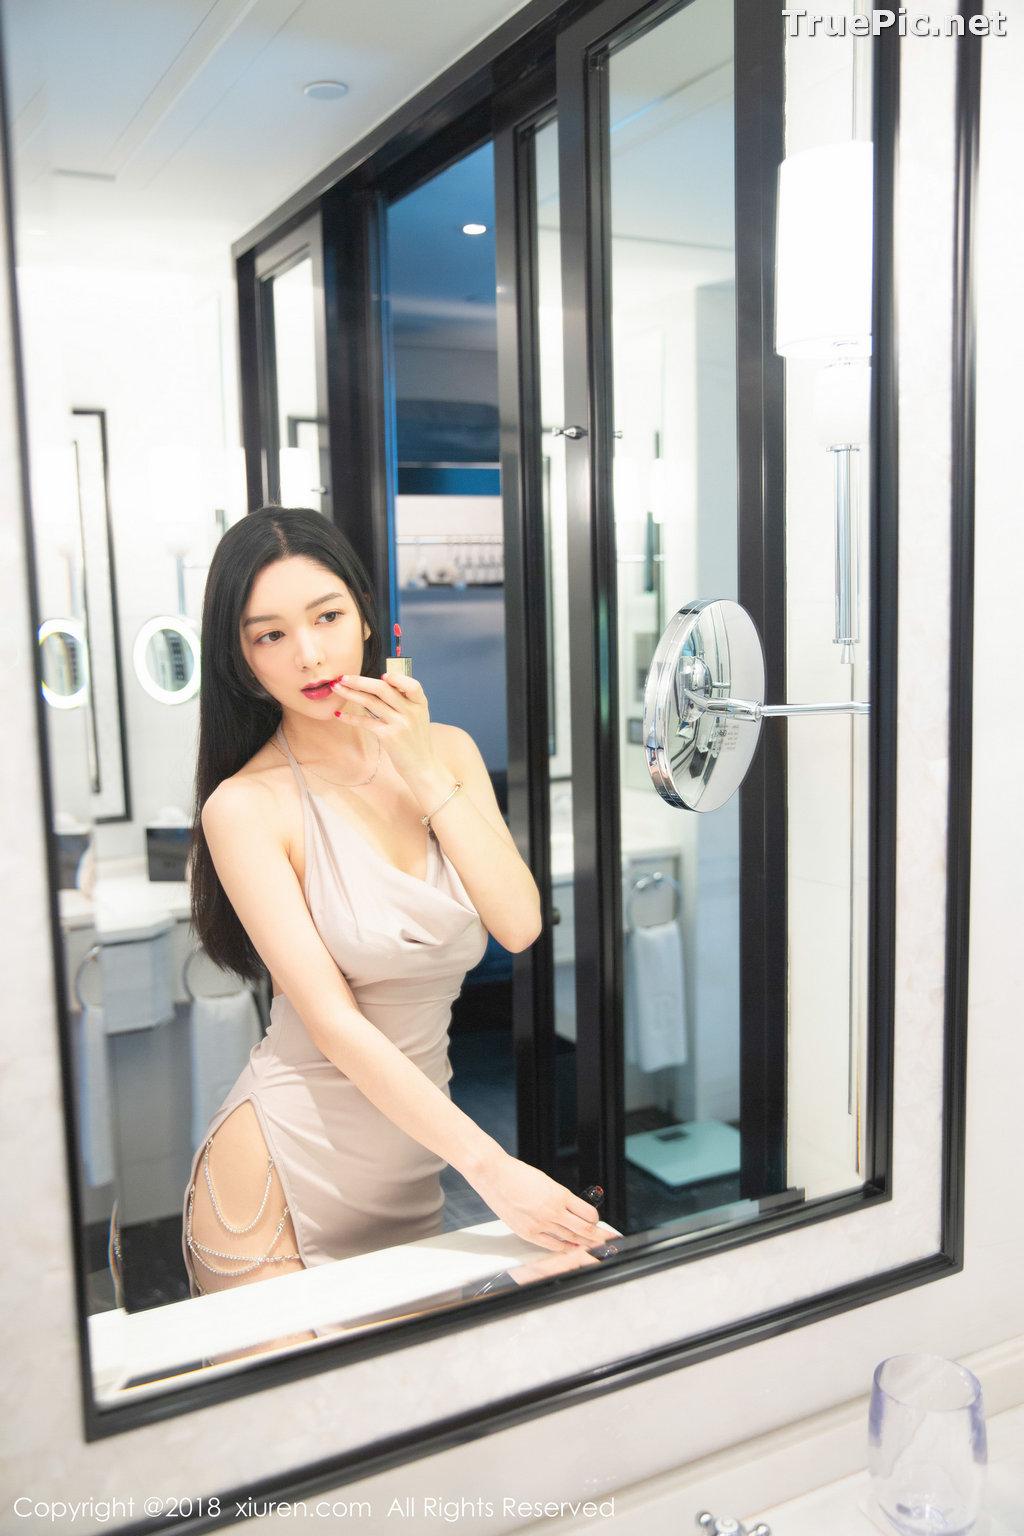 Image XIUREN No.1141 - Chinese Model - Xiao Reba (Angela小热巴) - Sexy Dress Tonight - TruePic.net - Picture-29